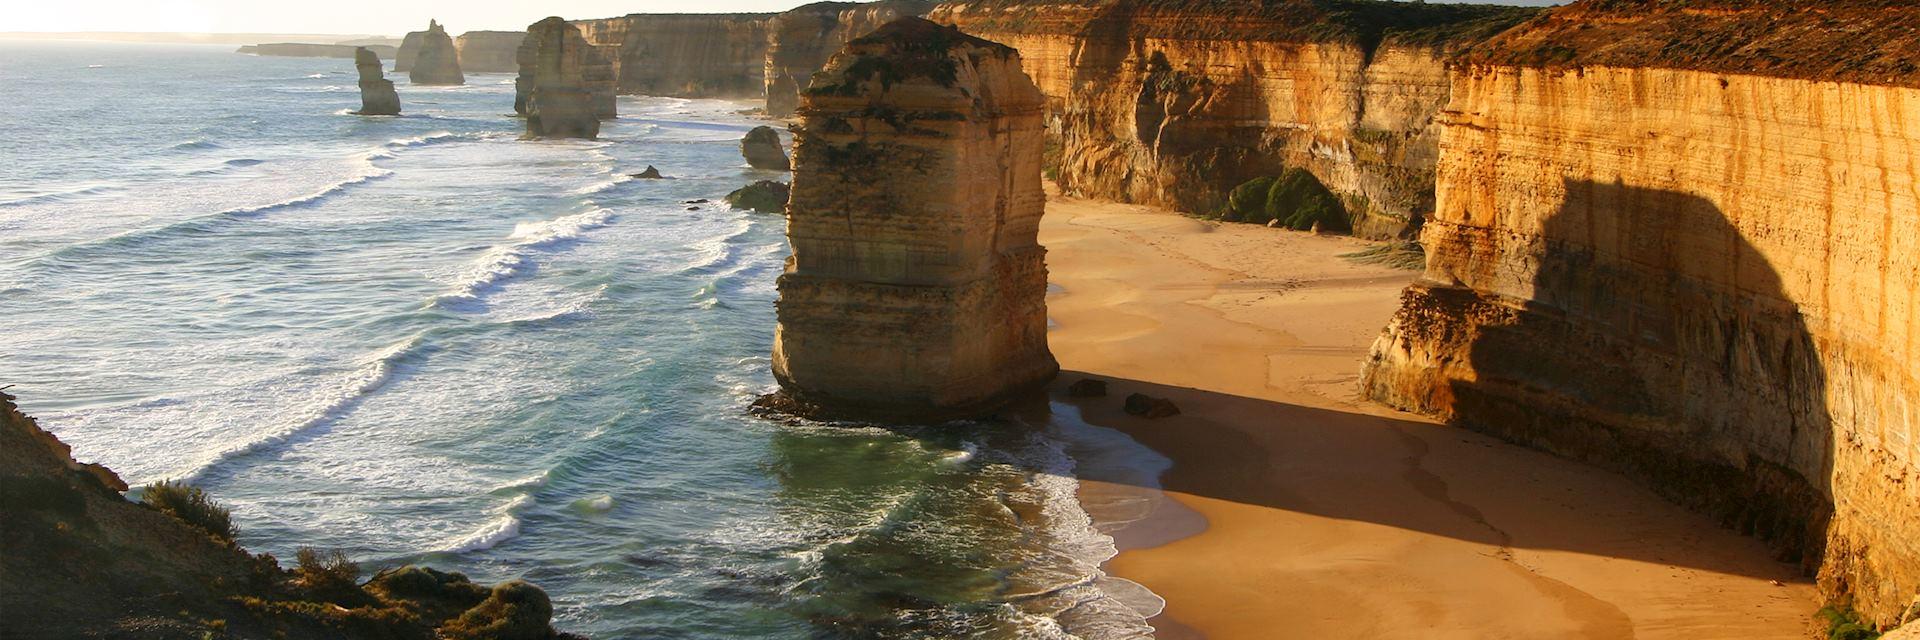 Twelve Apostles on the Great Ocean Road, Australia